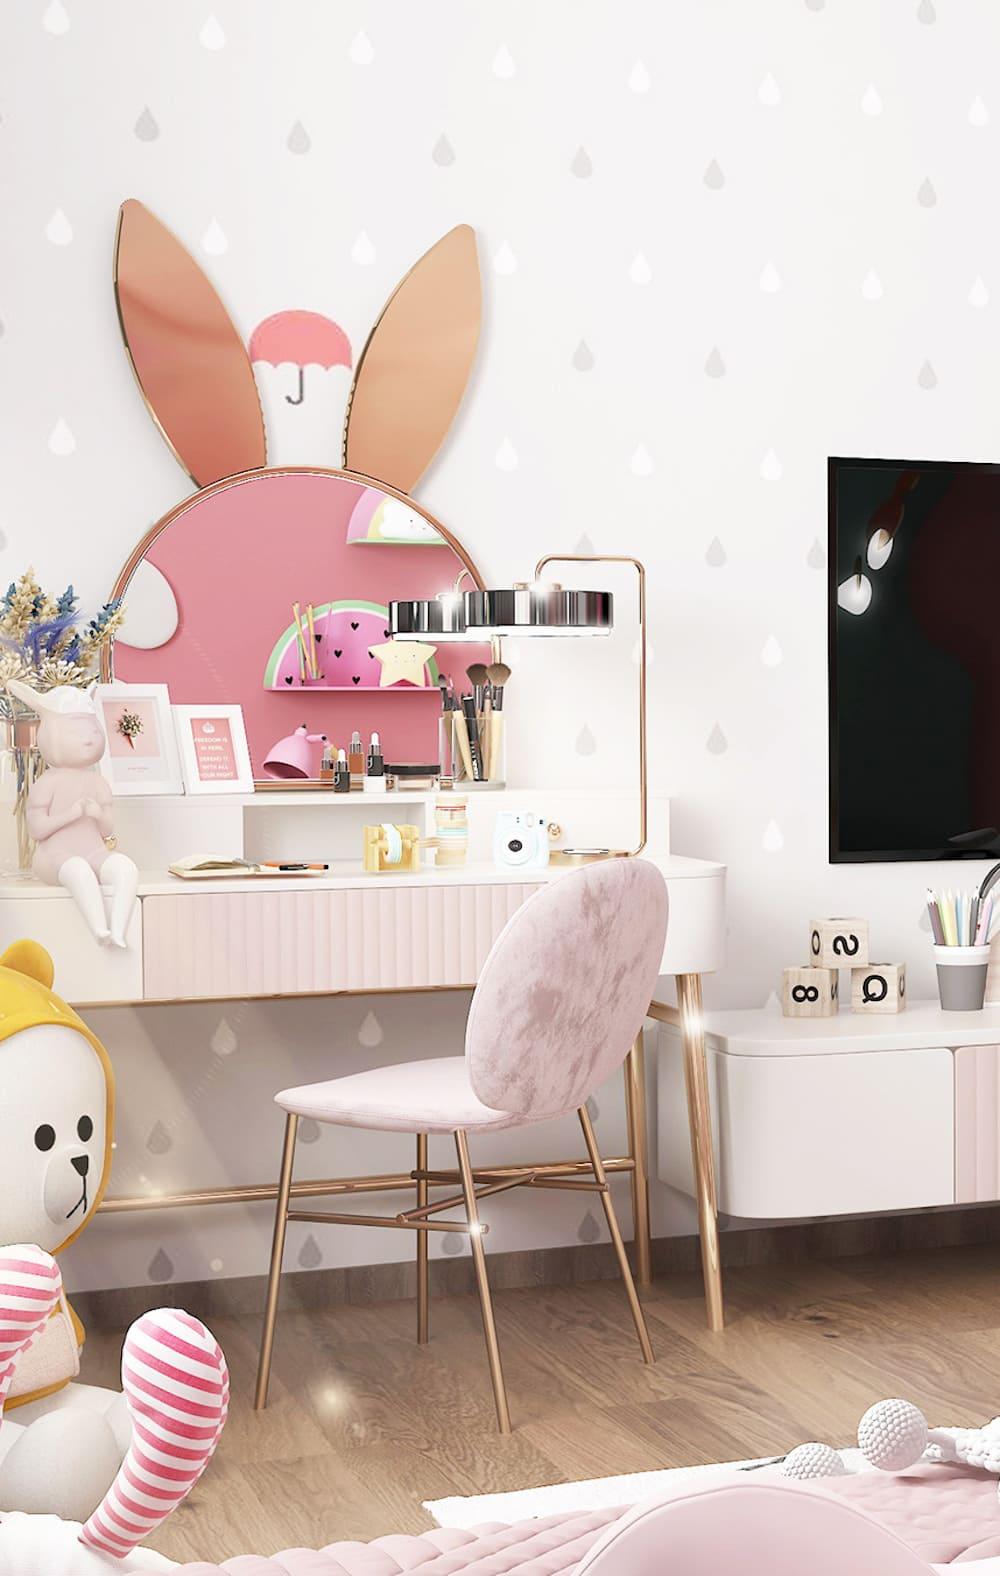 интерьер детской комнаты фото 26